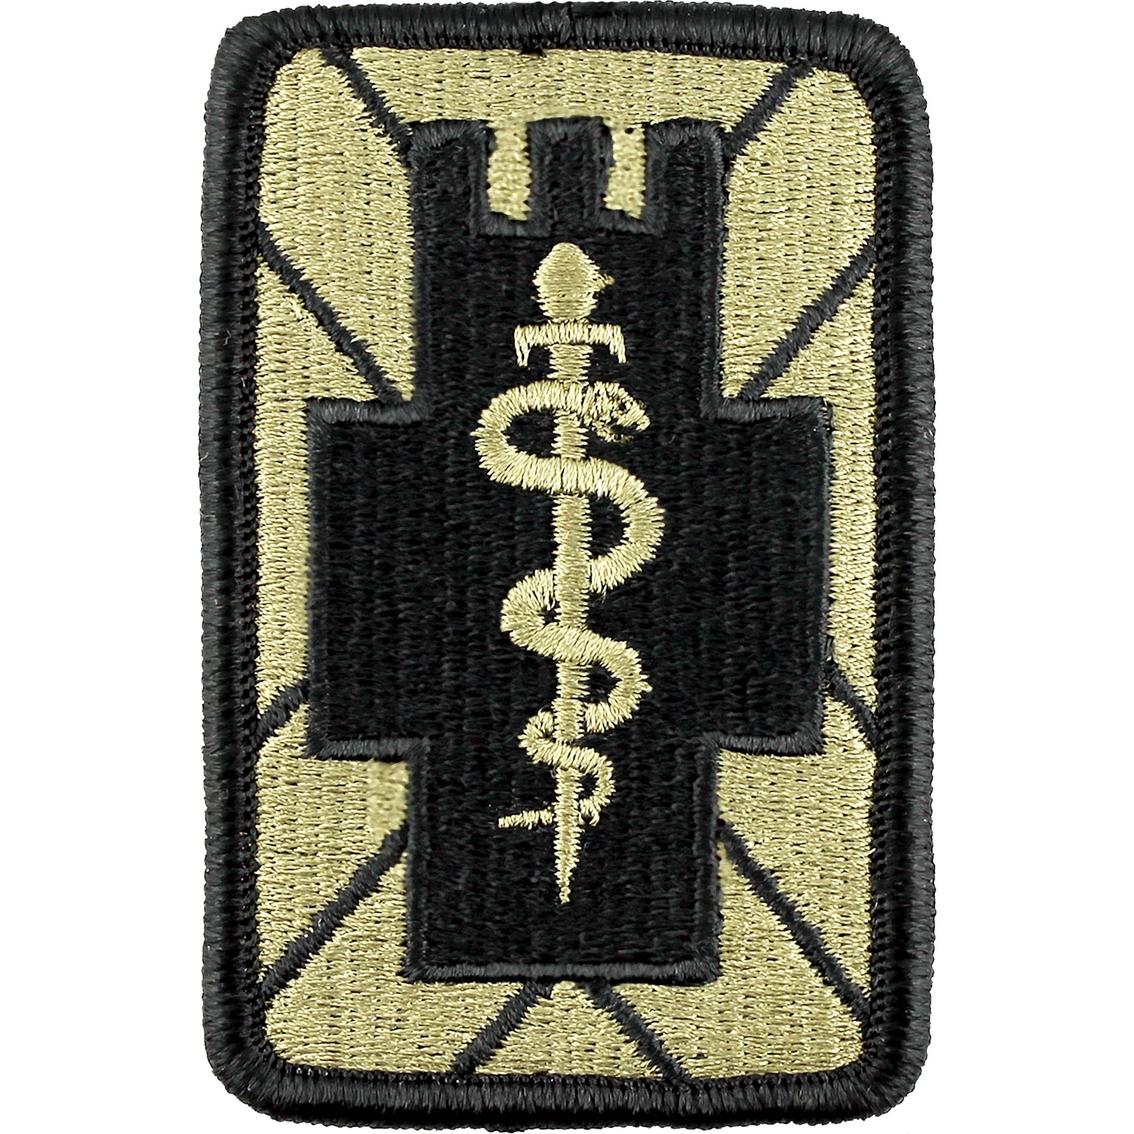 US Army 5th Medical Brigade dress uniform patch